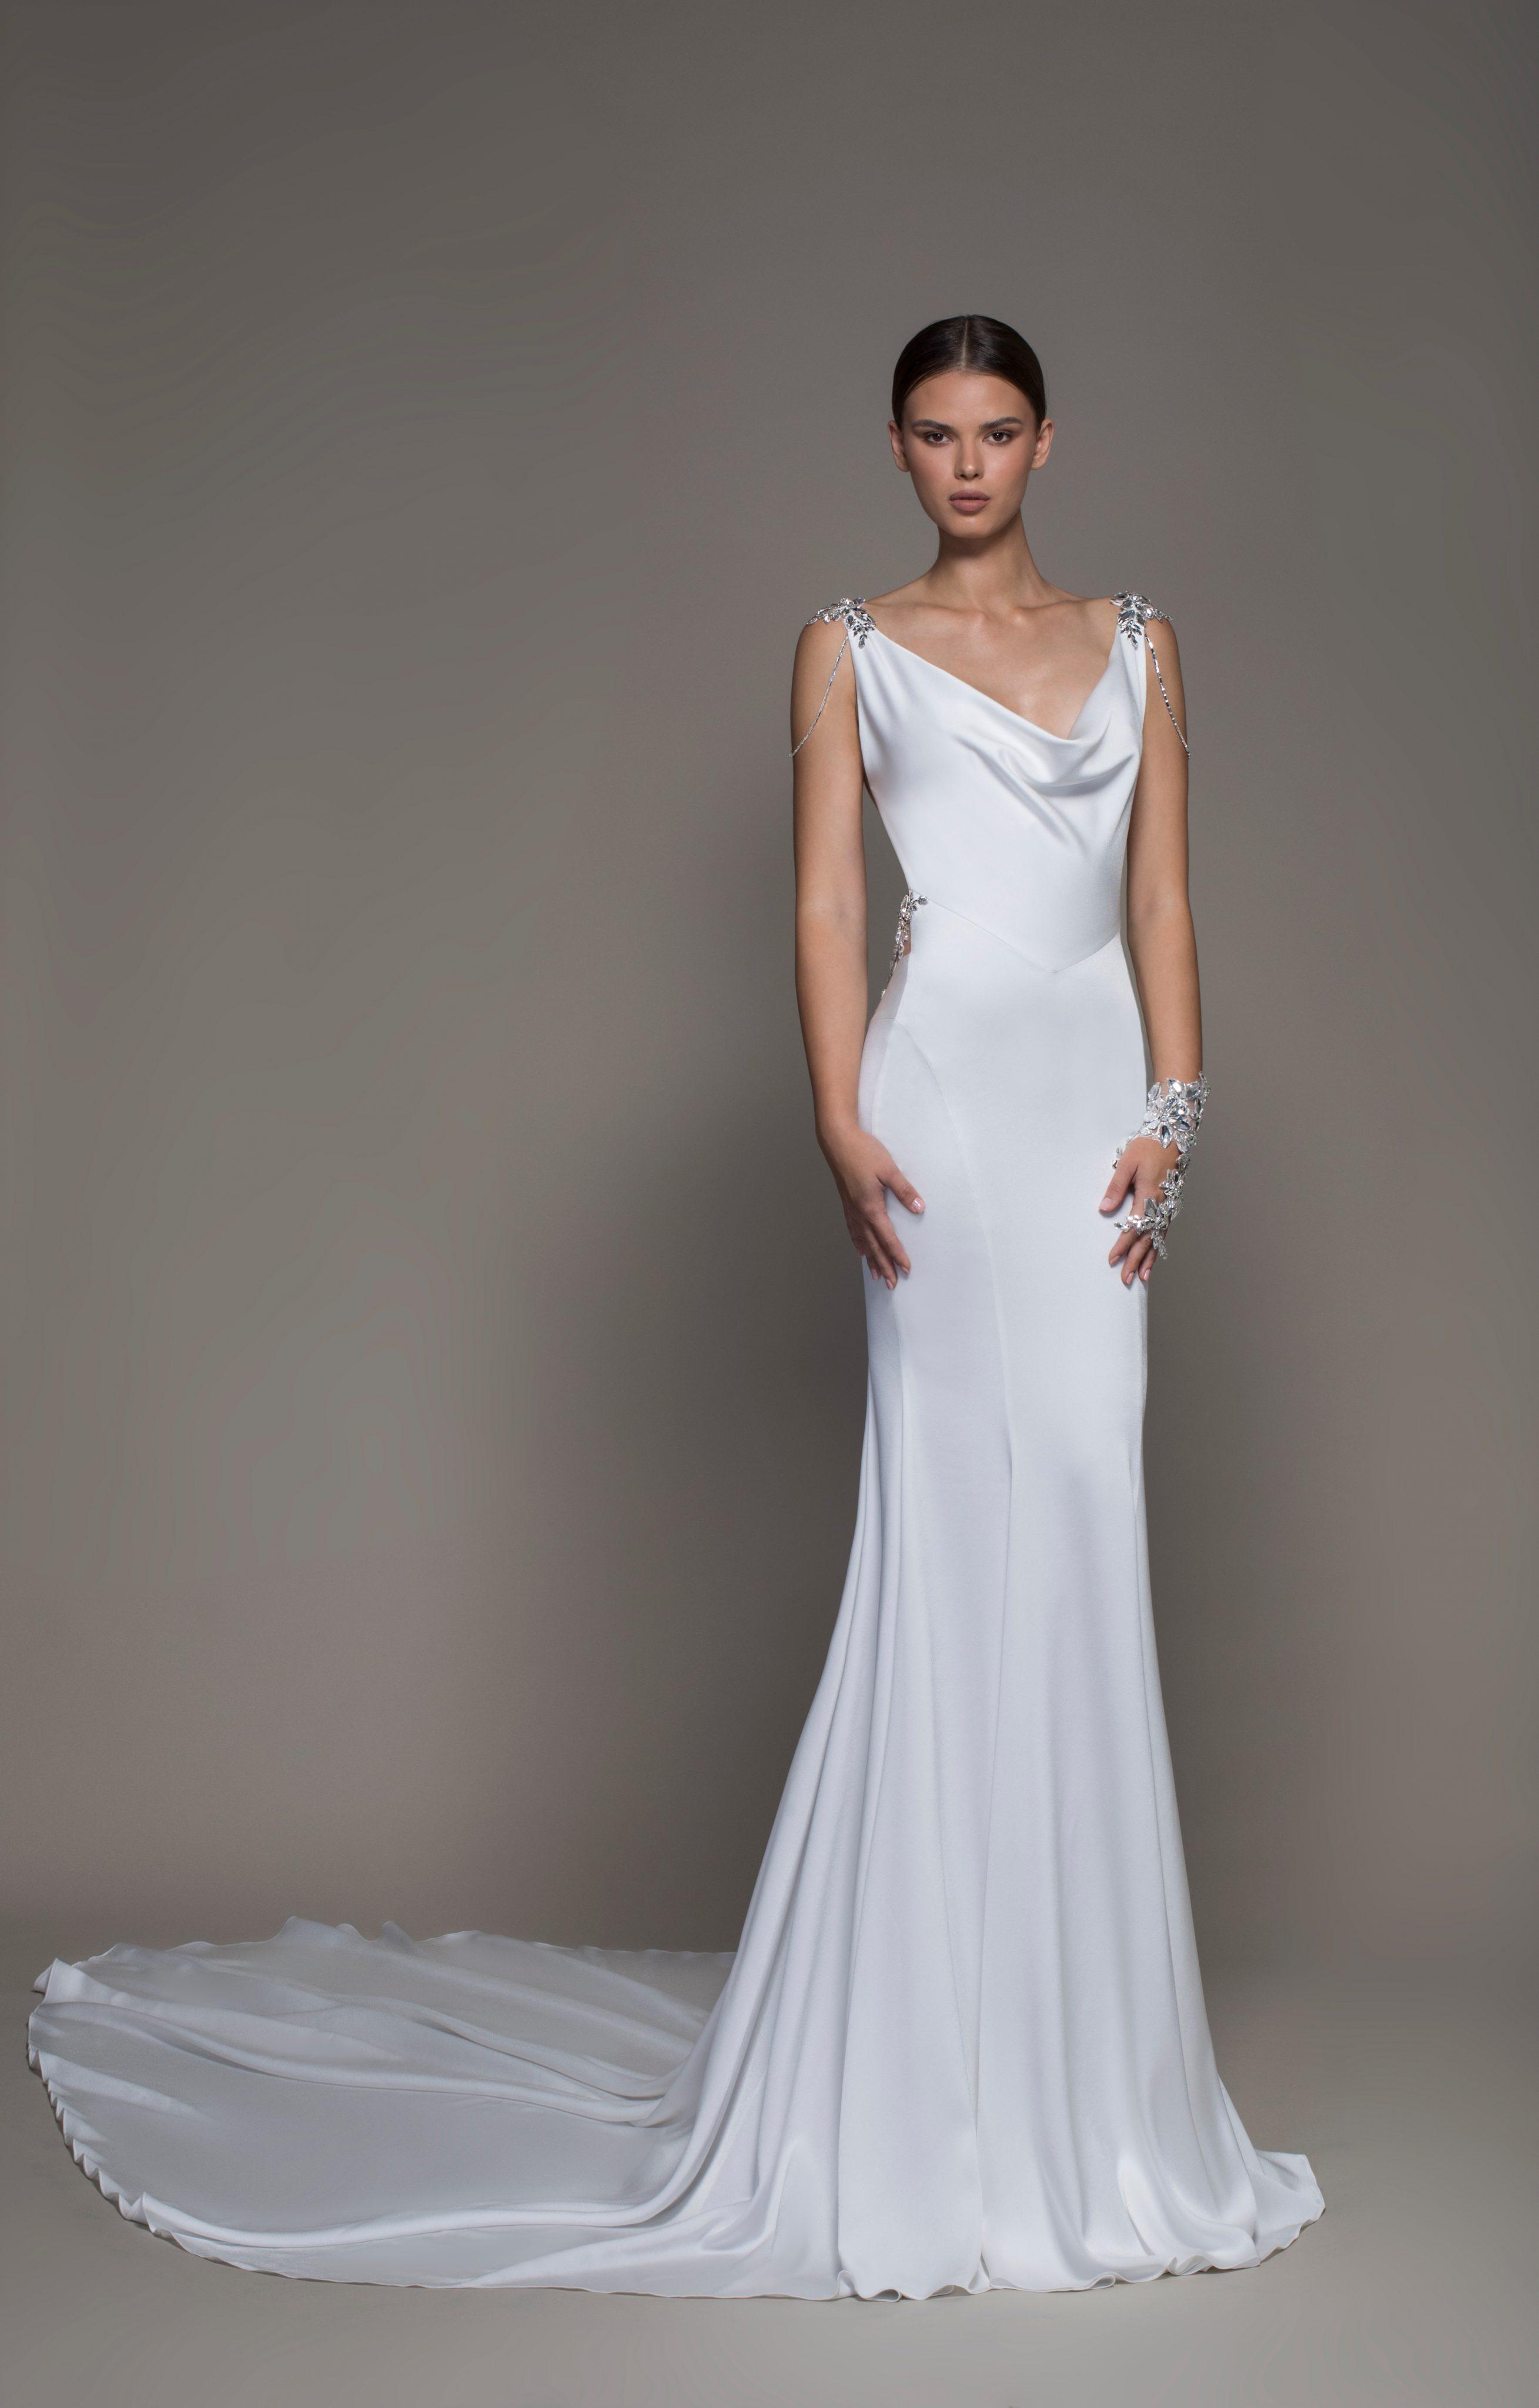 Cowl Neck Wedding Dress With Sleeves Weddings Dresses